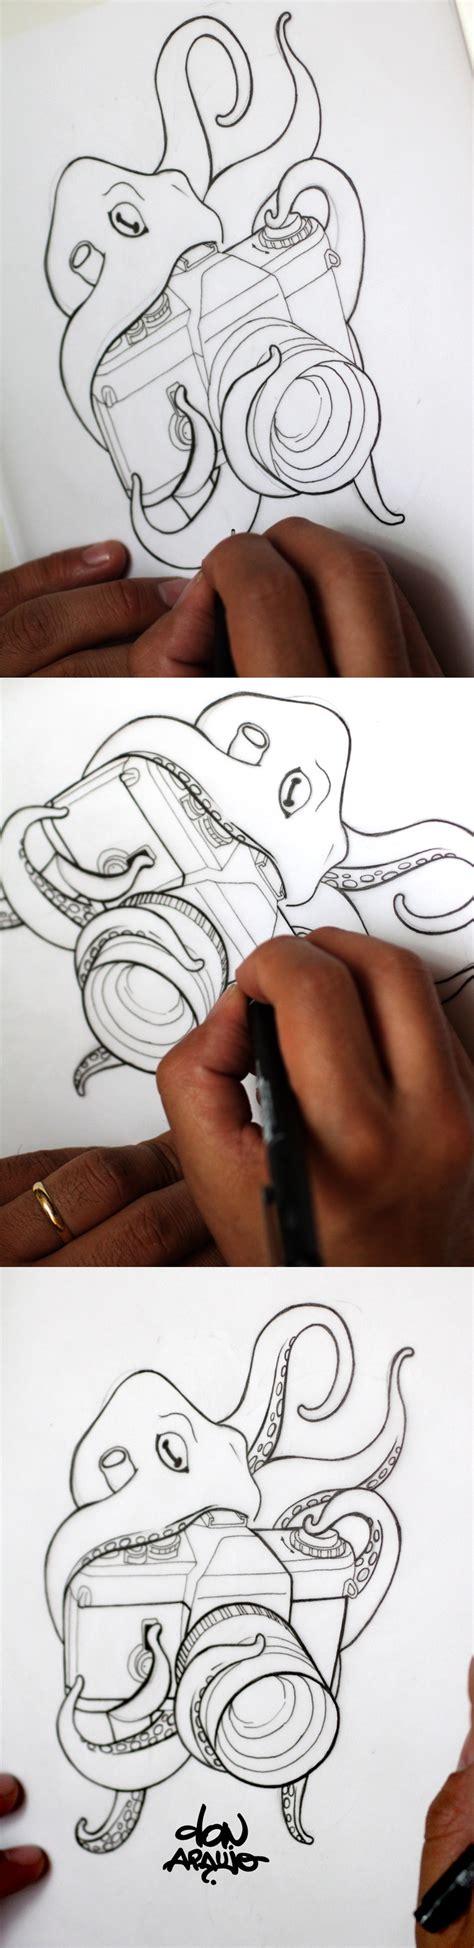 flash tattoo jobs to my new tattoo love octopus and my first cam reflex